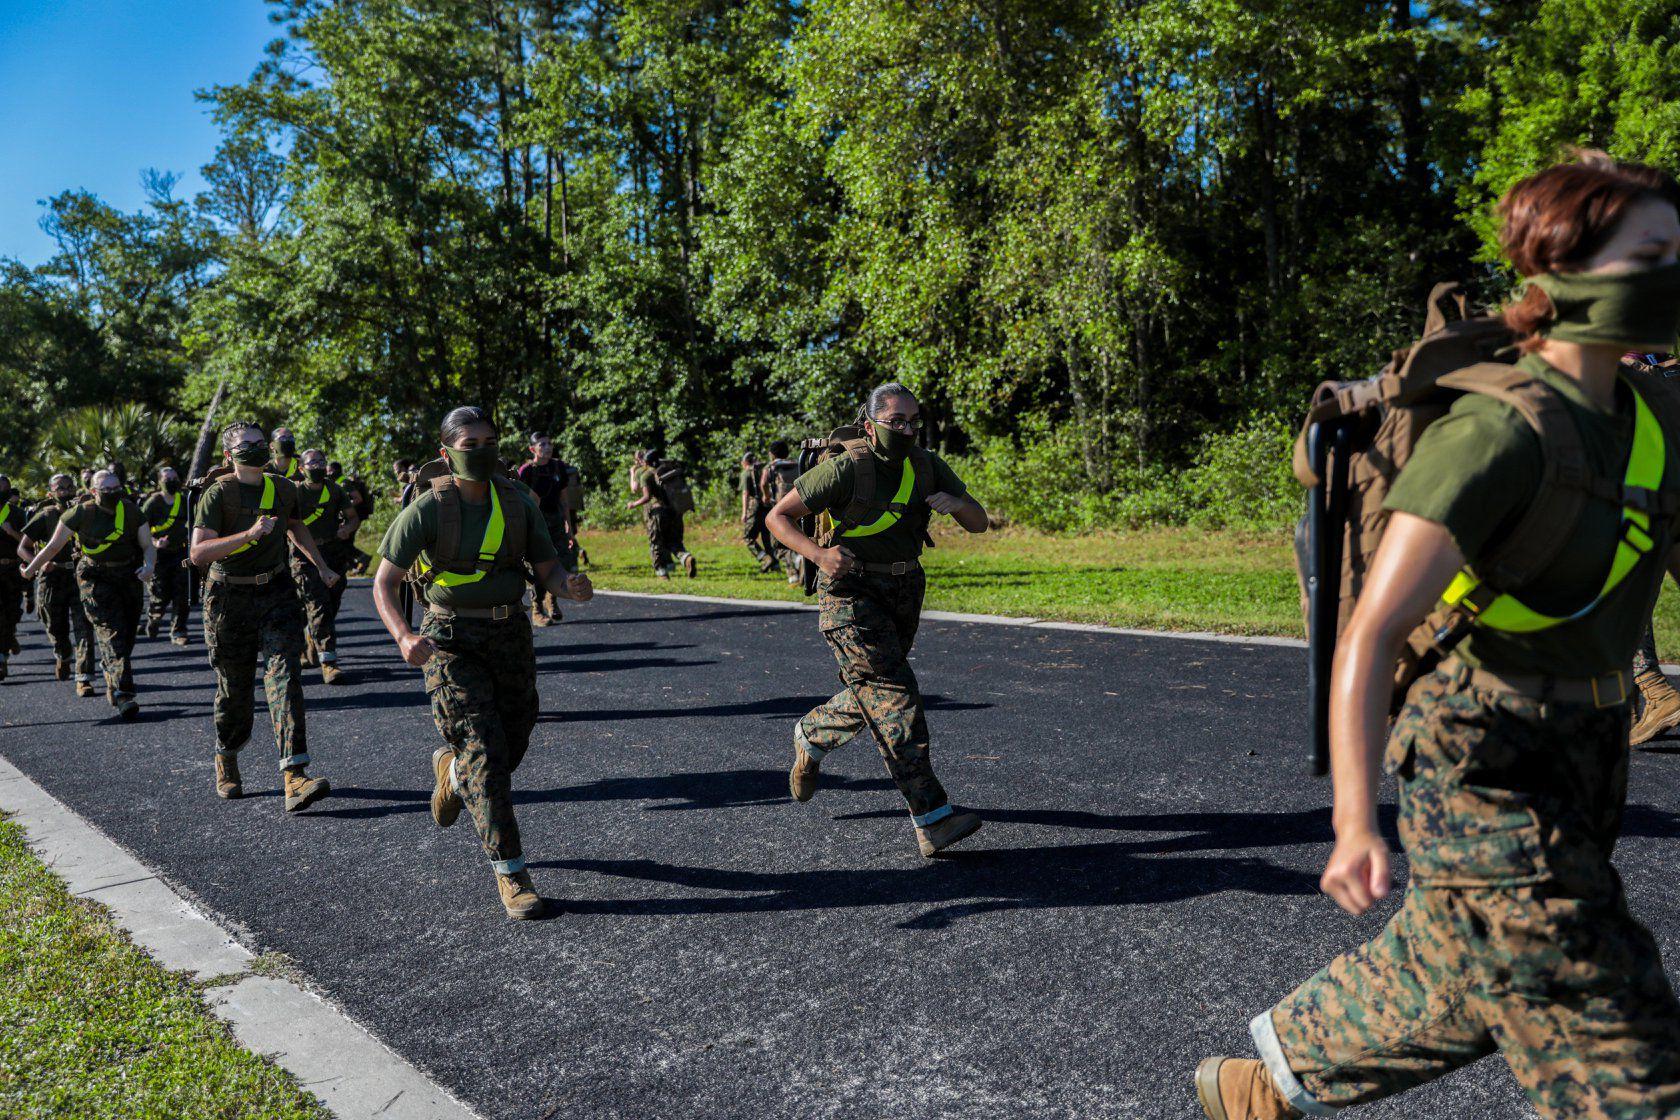 Having COVID doesn't guarantee immunity, study of Marine recruits finds